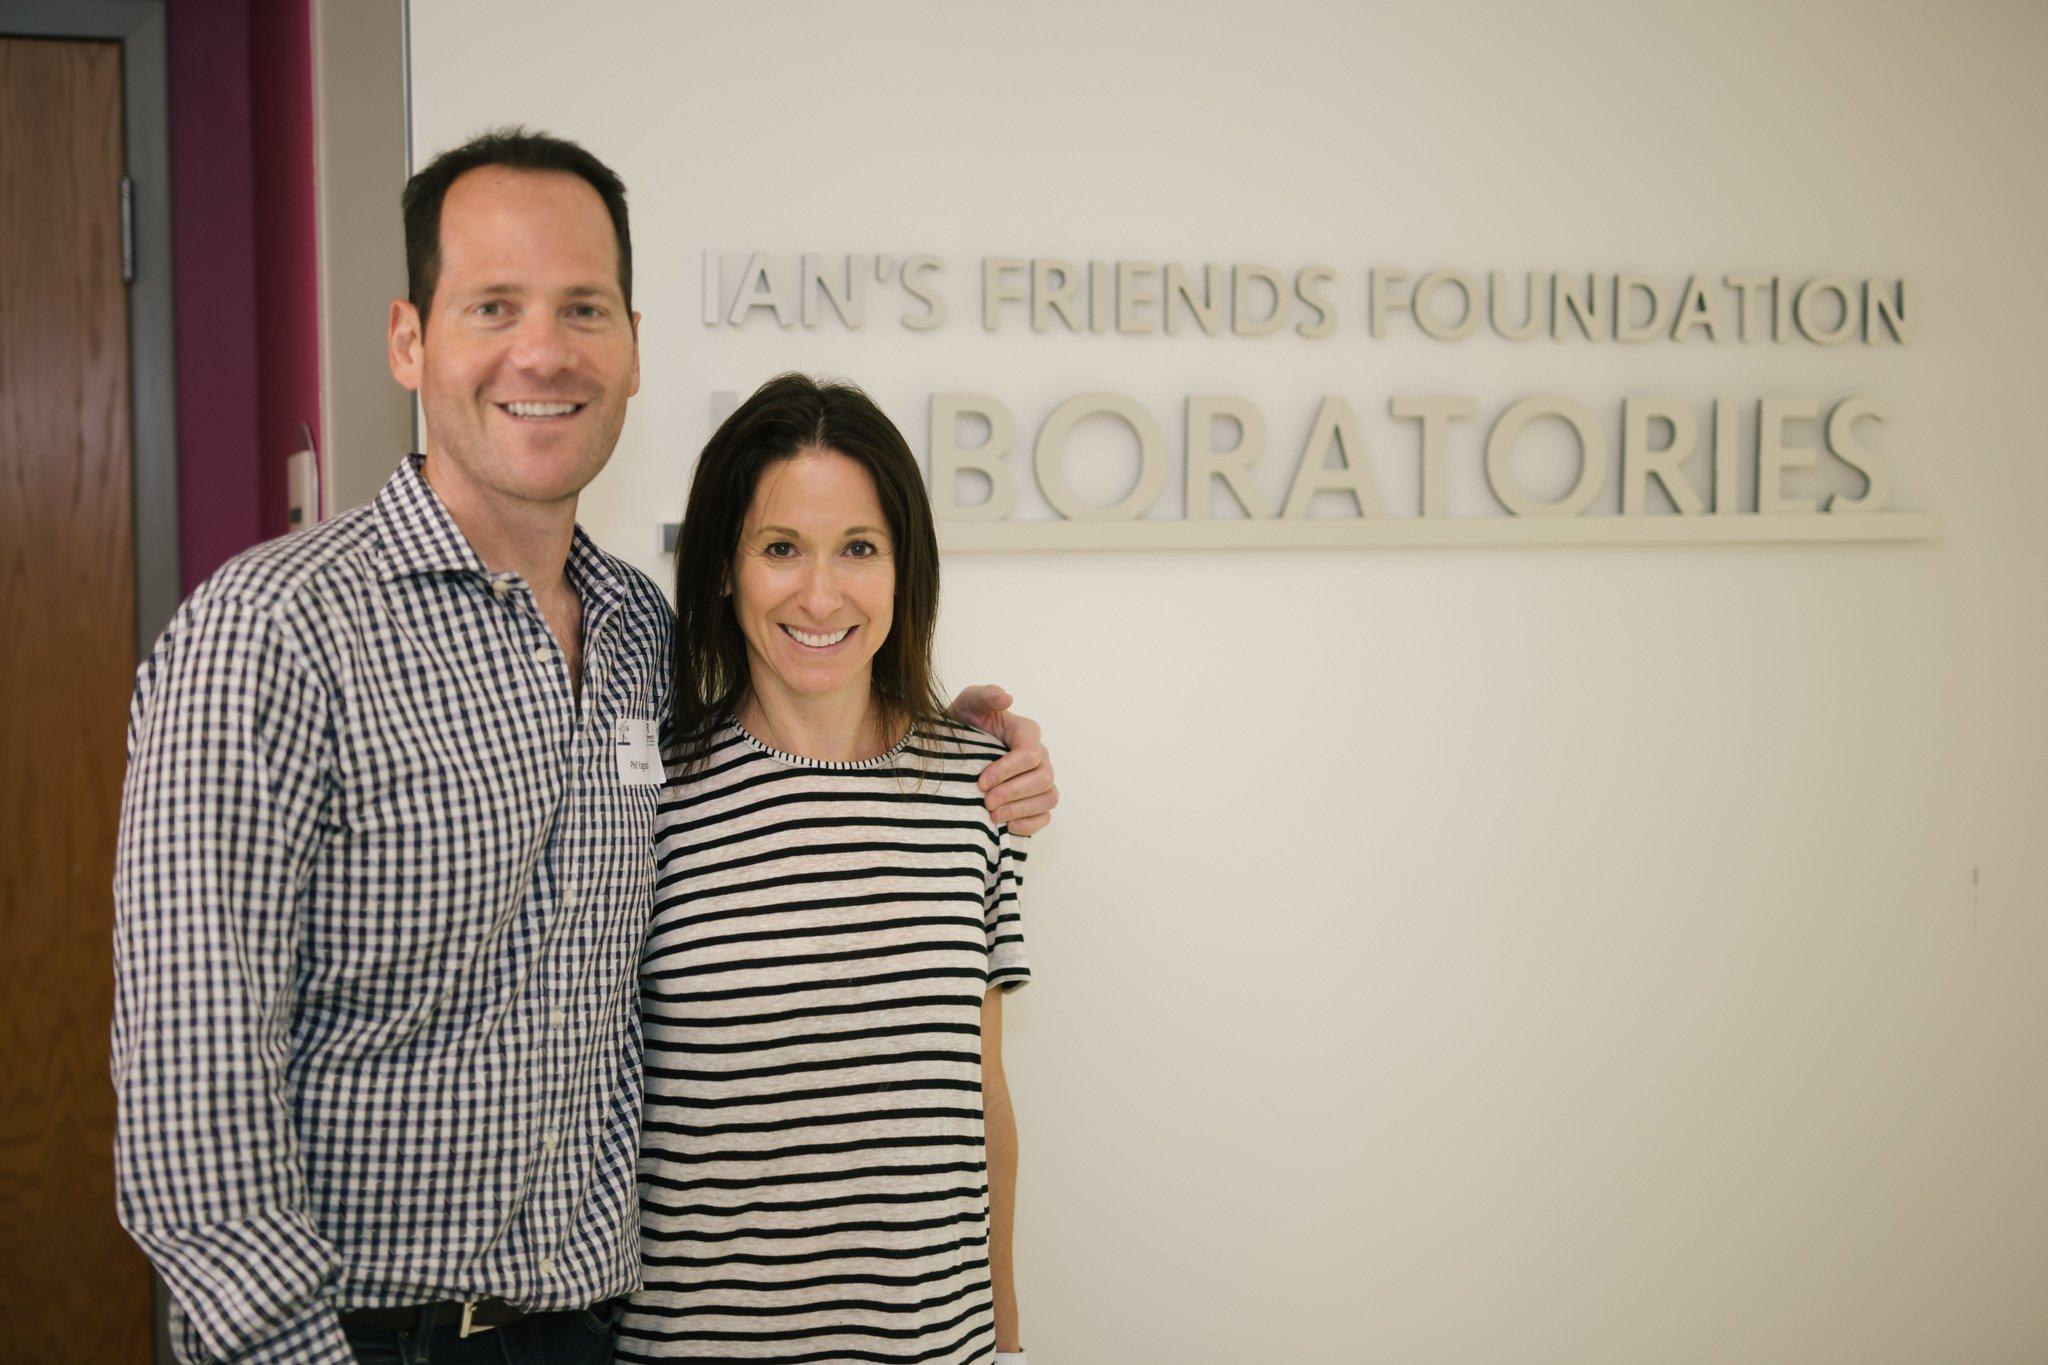 Atlanta couple shines light on childhood brain tumors